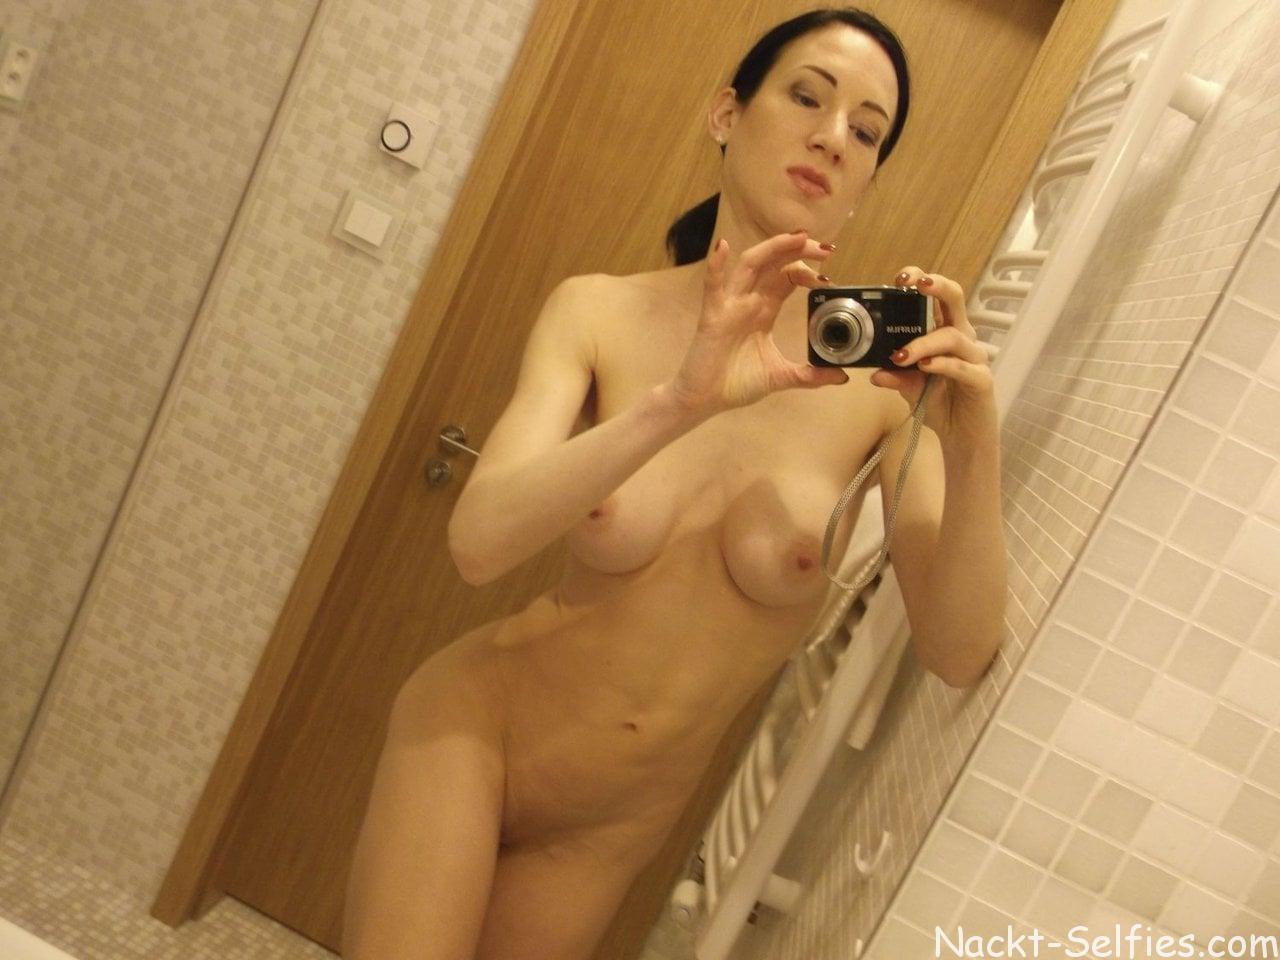 Amateur nackt selfies